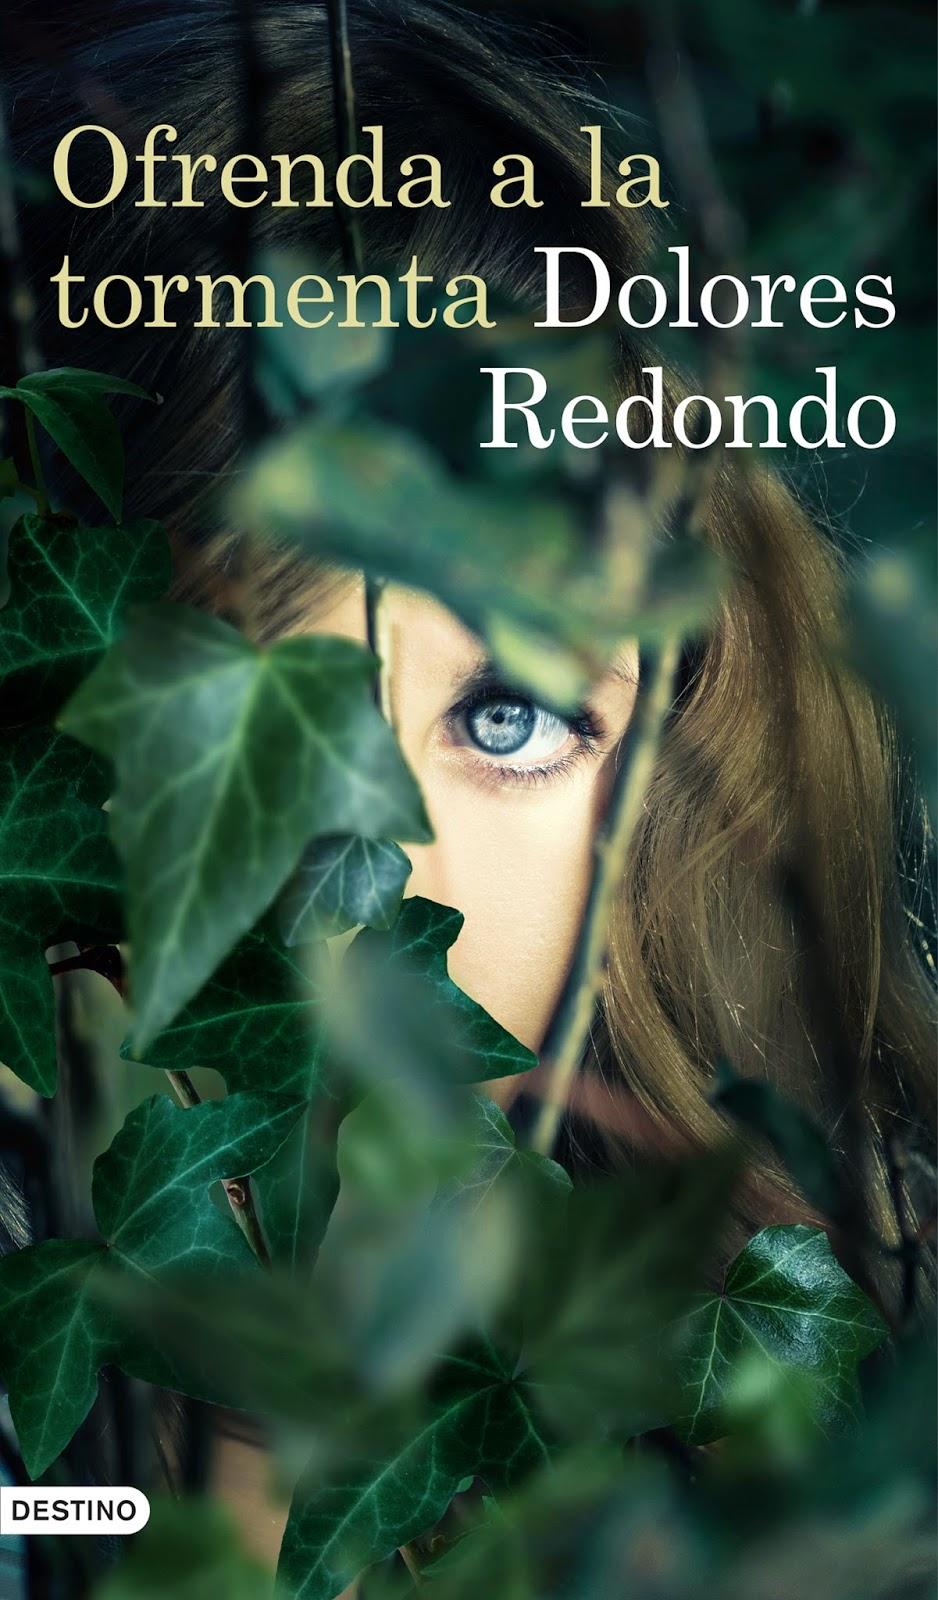 http://www.planetadelibros.com/ofrenda-a-la-tormenta-libro-170573.html